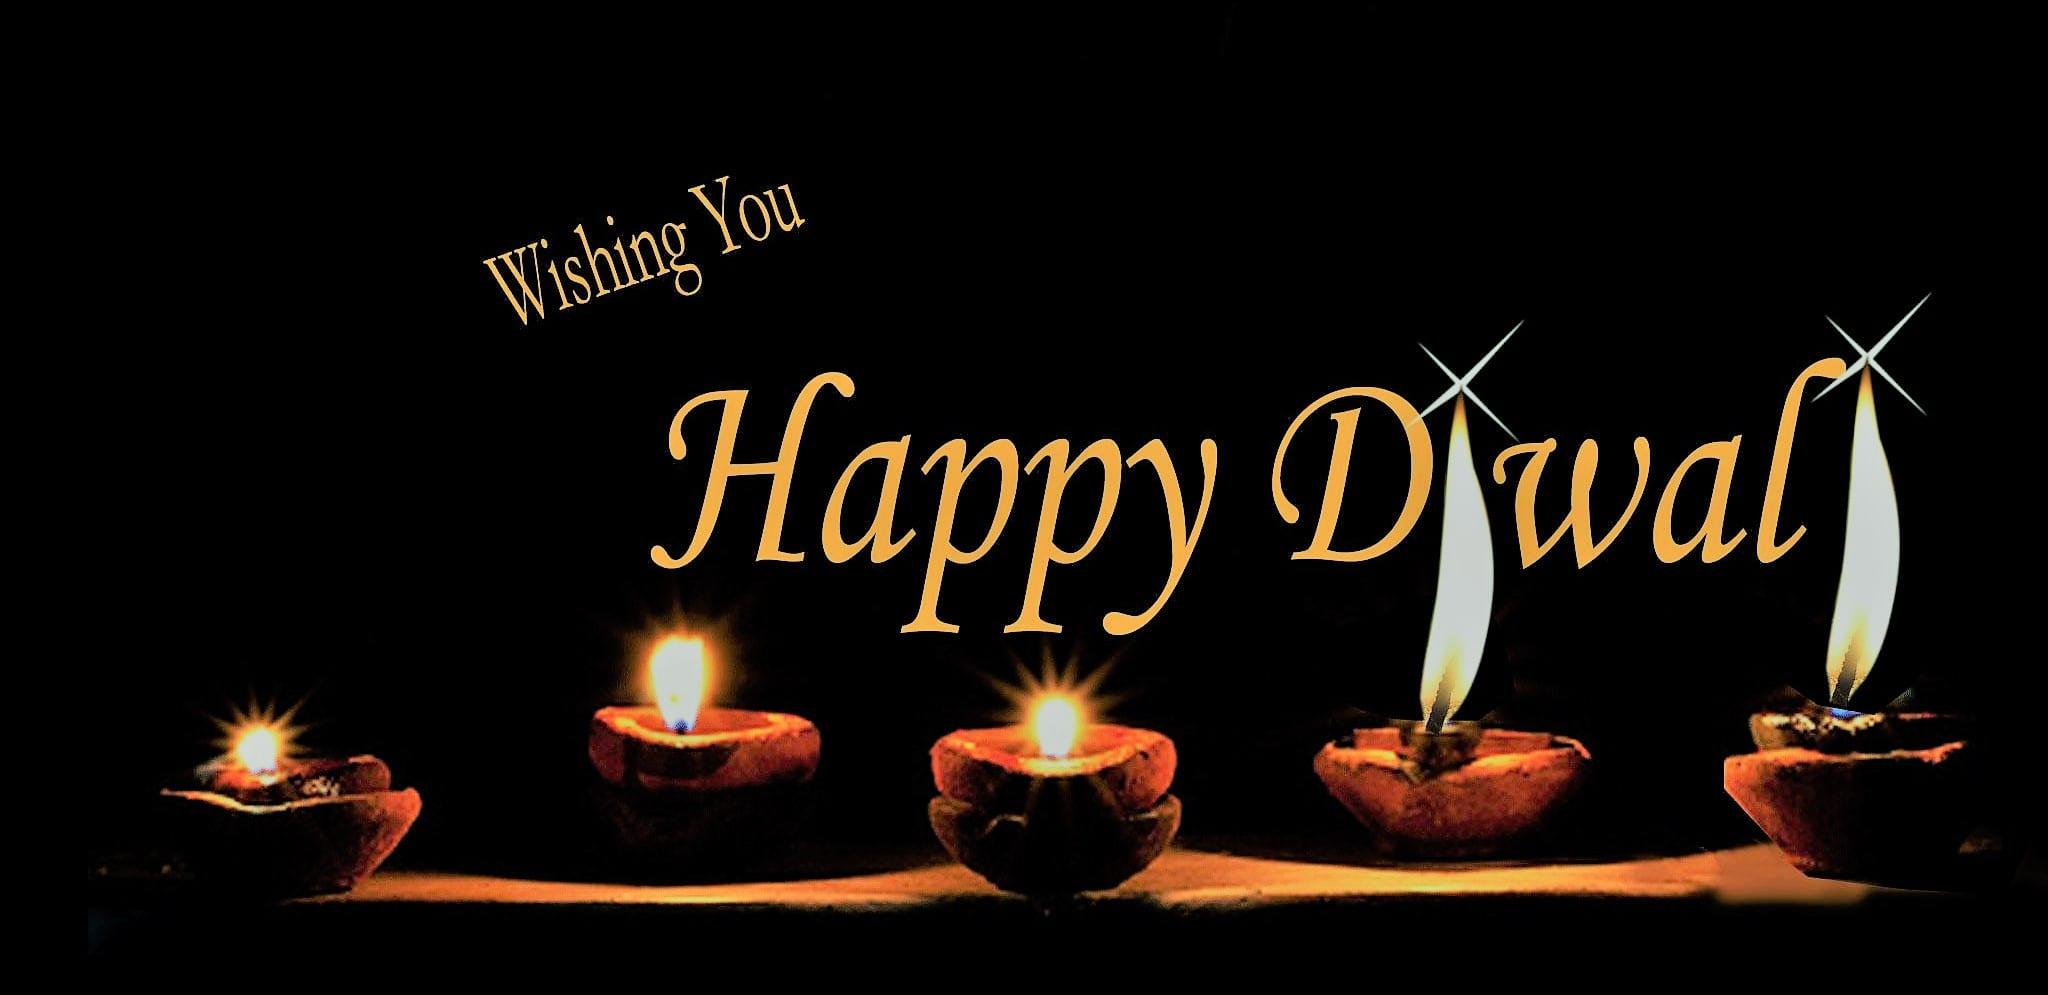 happy diwali 2018 images download